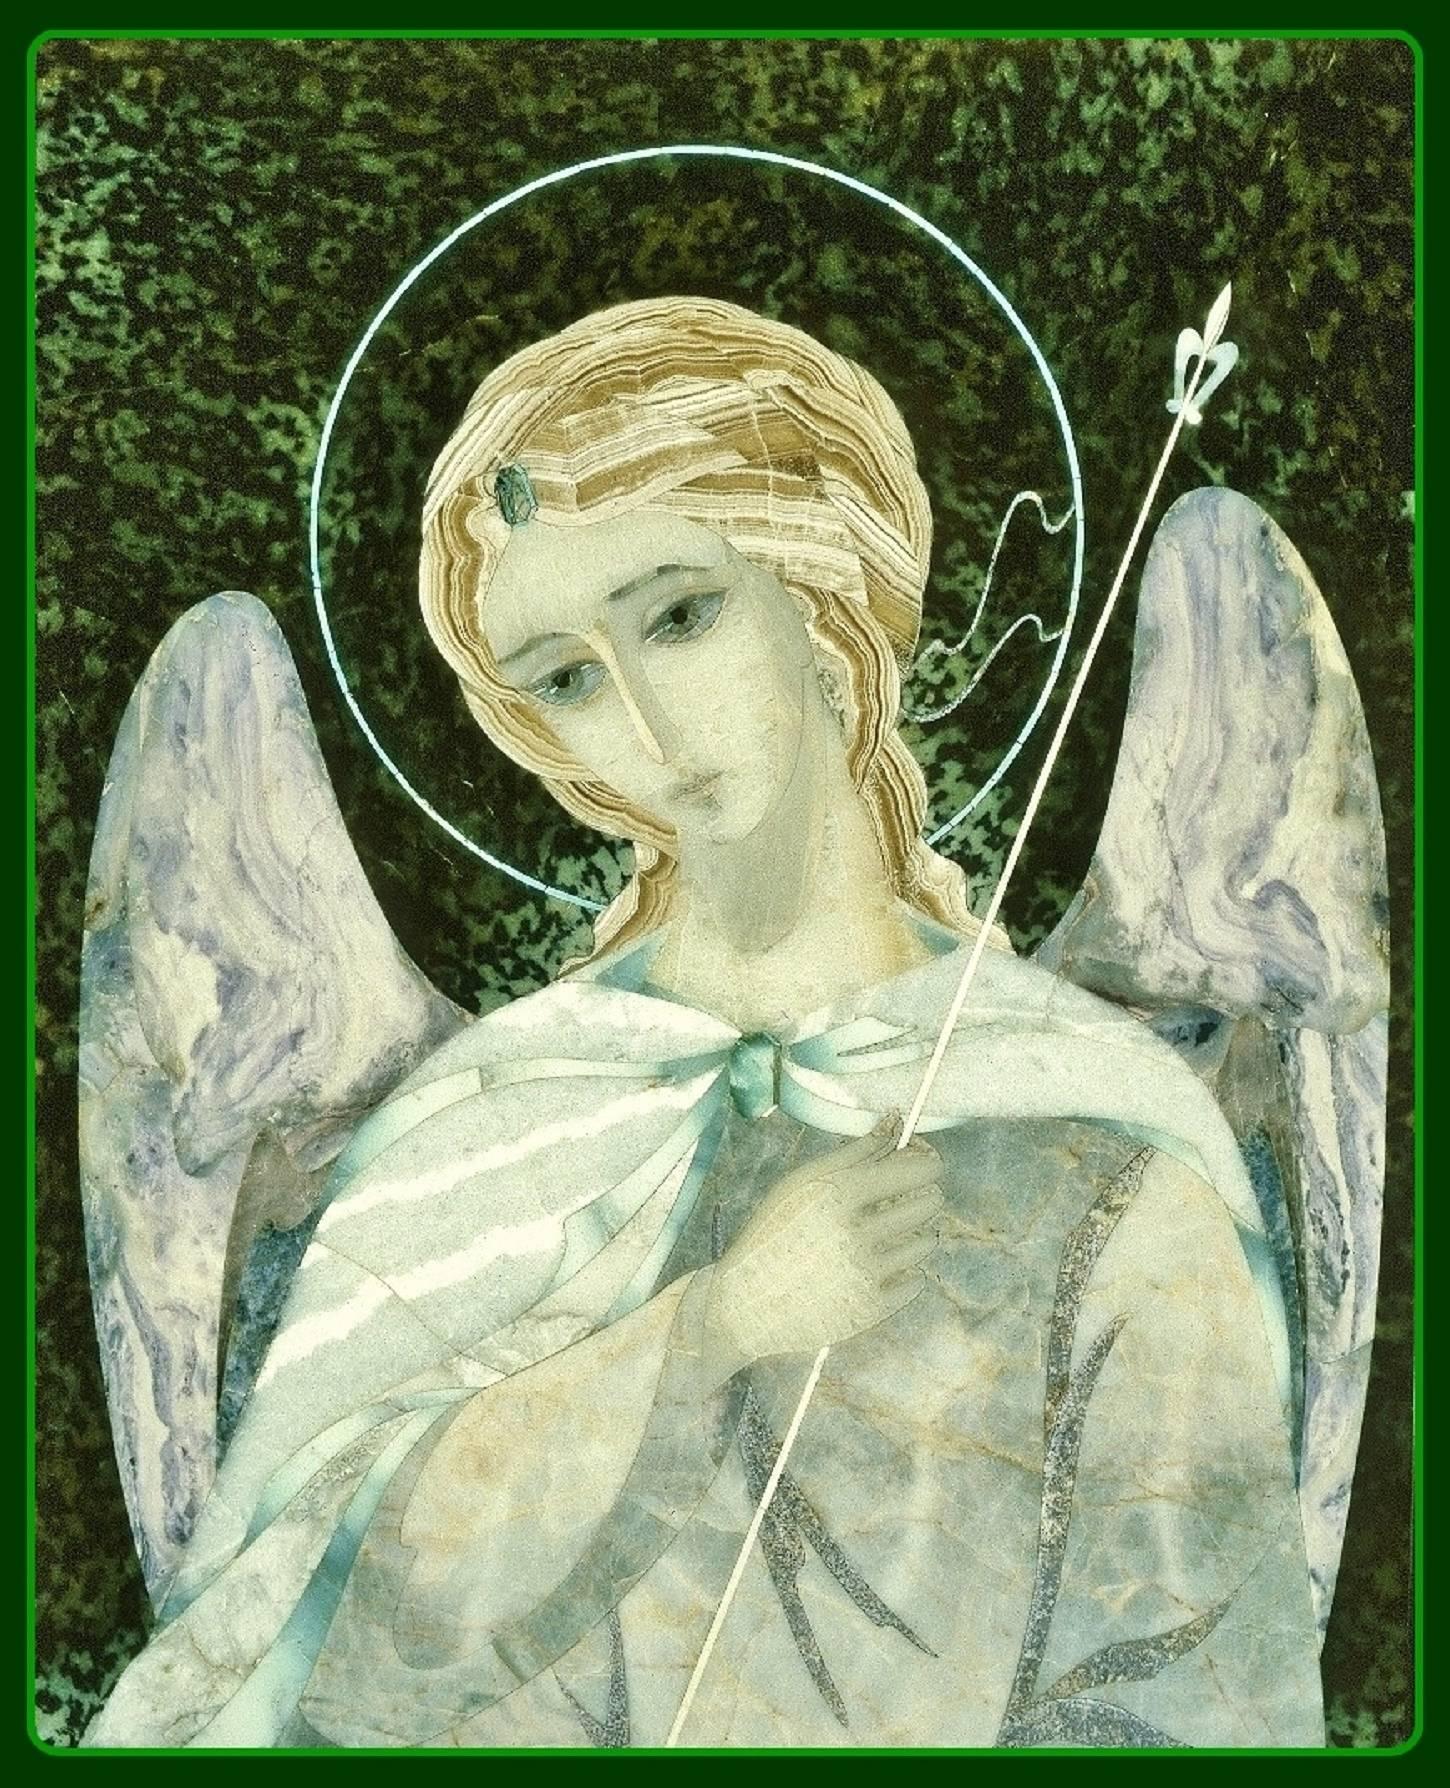 """Ангел"" : серпентинит, халцедон сиреневый, хризопраз. мрамор, оникс, бирюза."